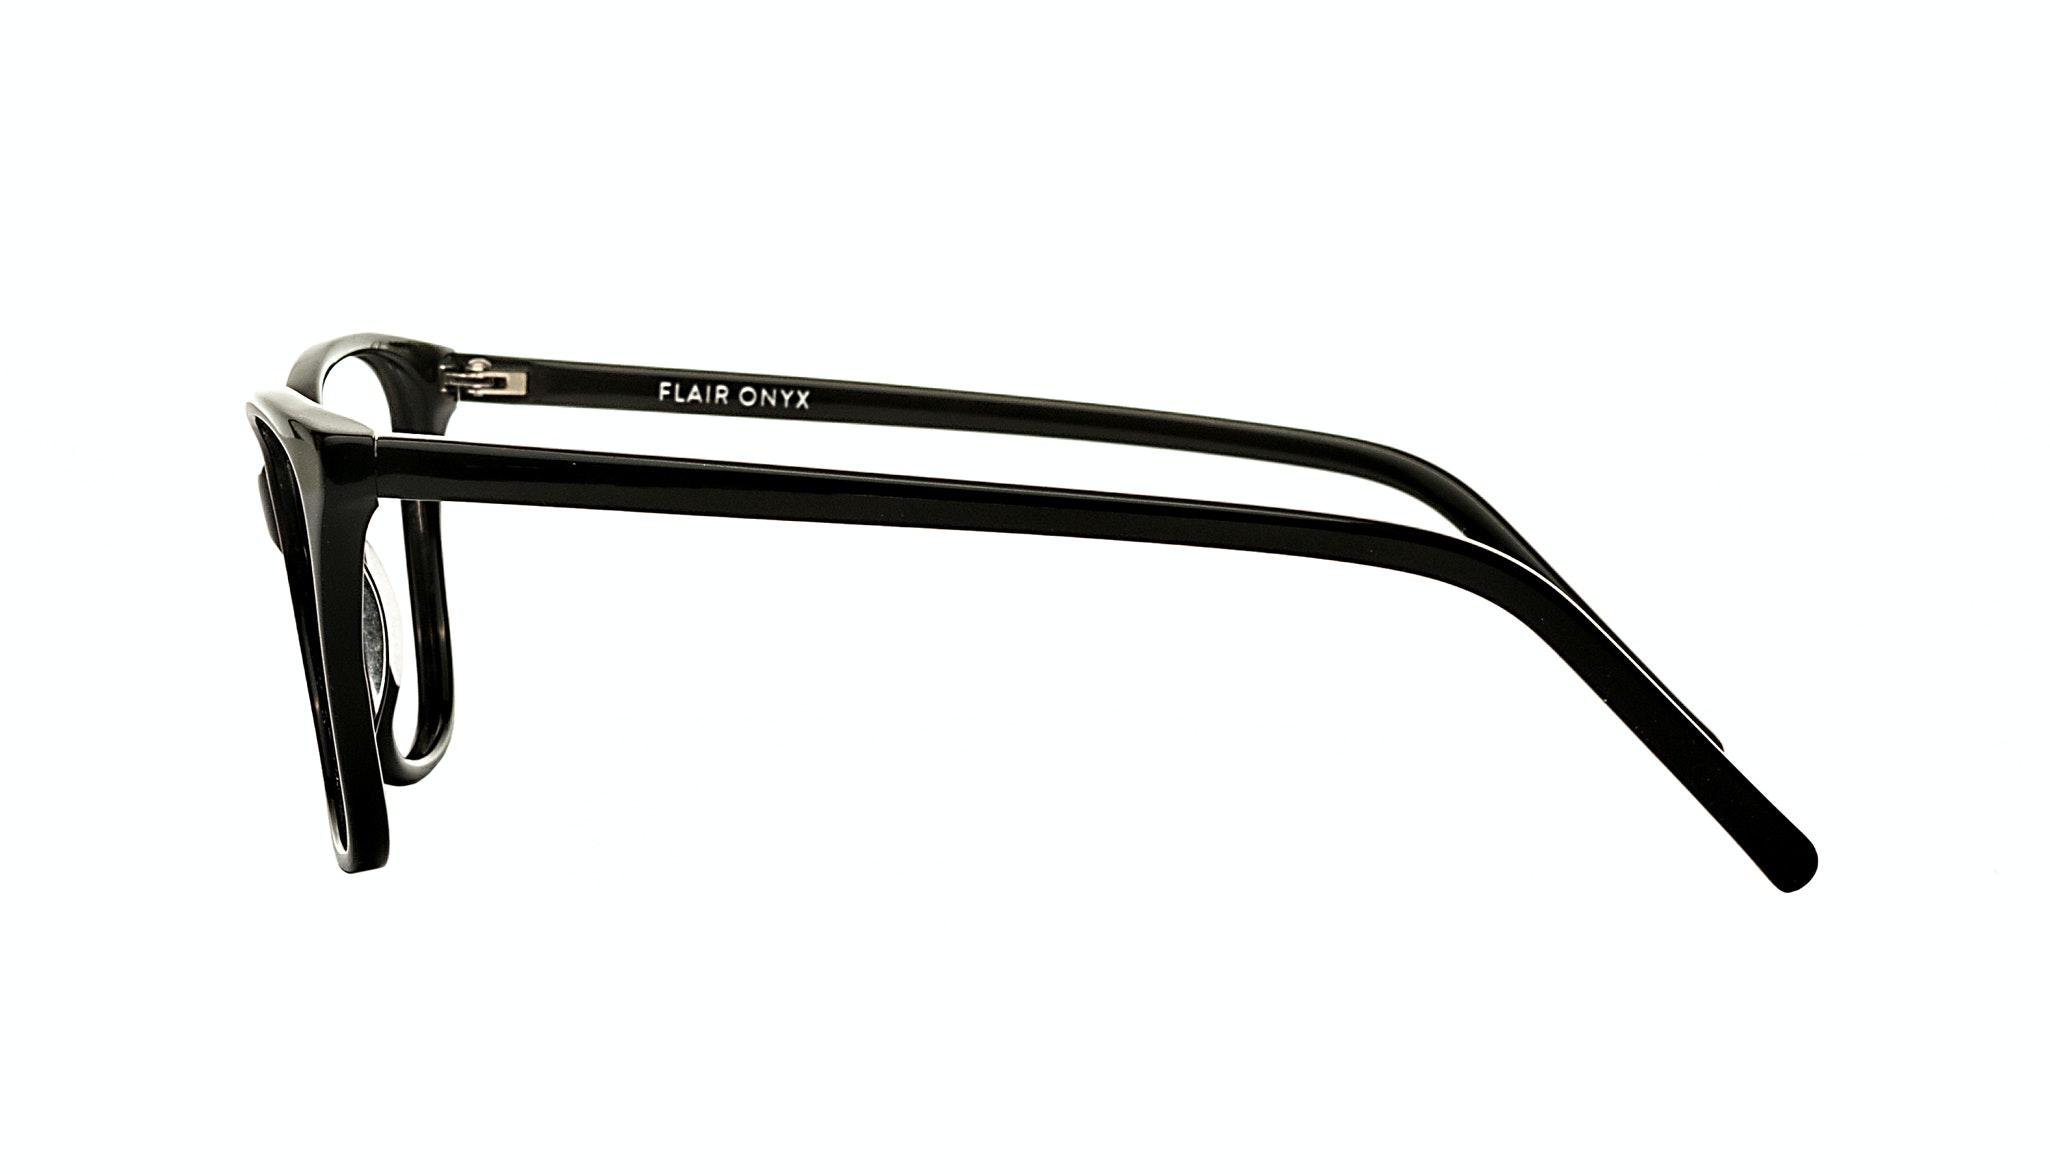 Affordable Fashion Glasses Cat Eye Rectangle Eyeglasses Women Flair Onyx Side